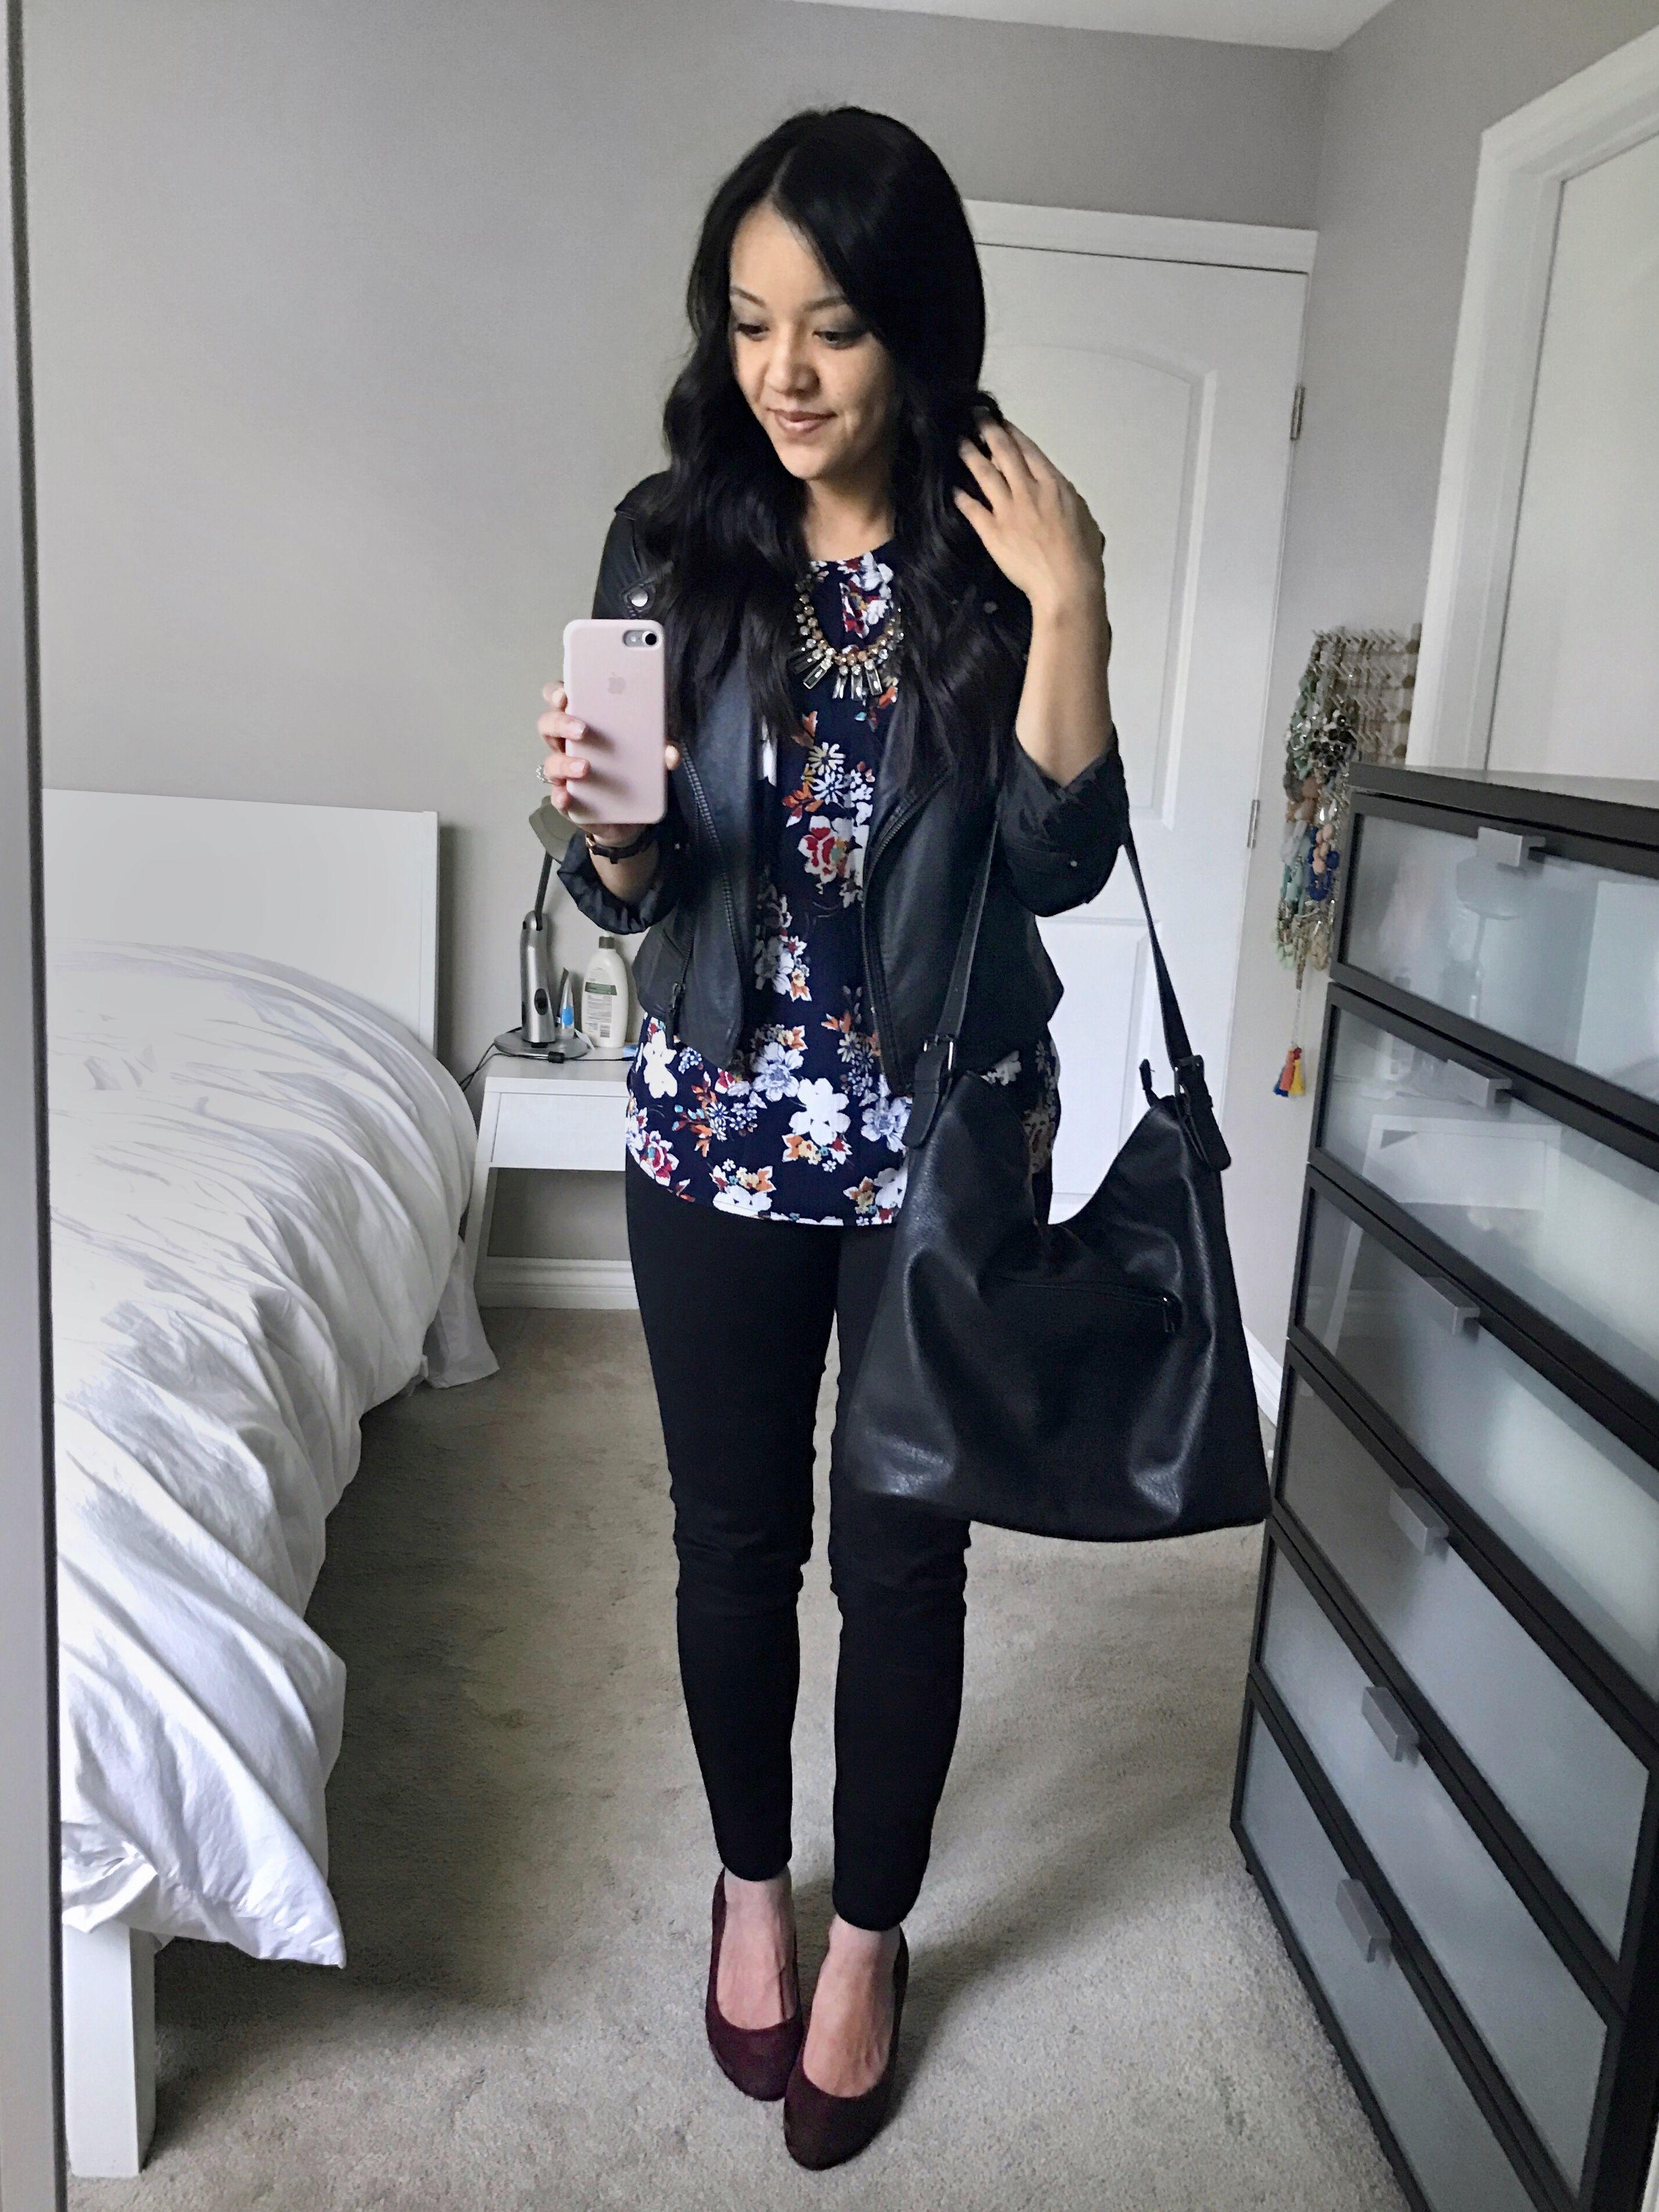 5245670bfcc Navy Floral Print Top + Black Jeans + Maroon Pumps + Black Faux Leather  Jacket